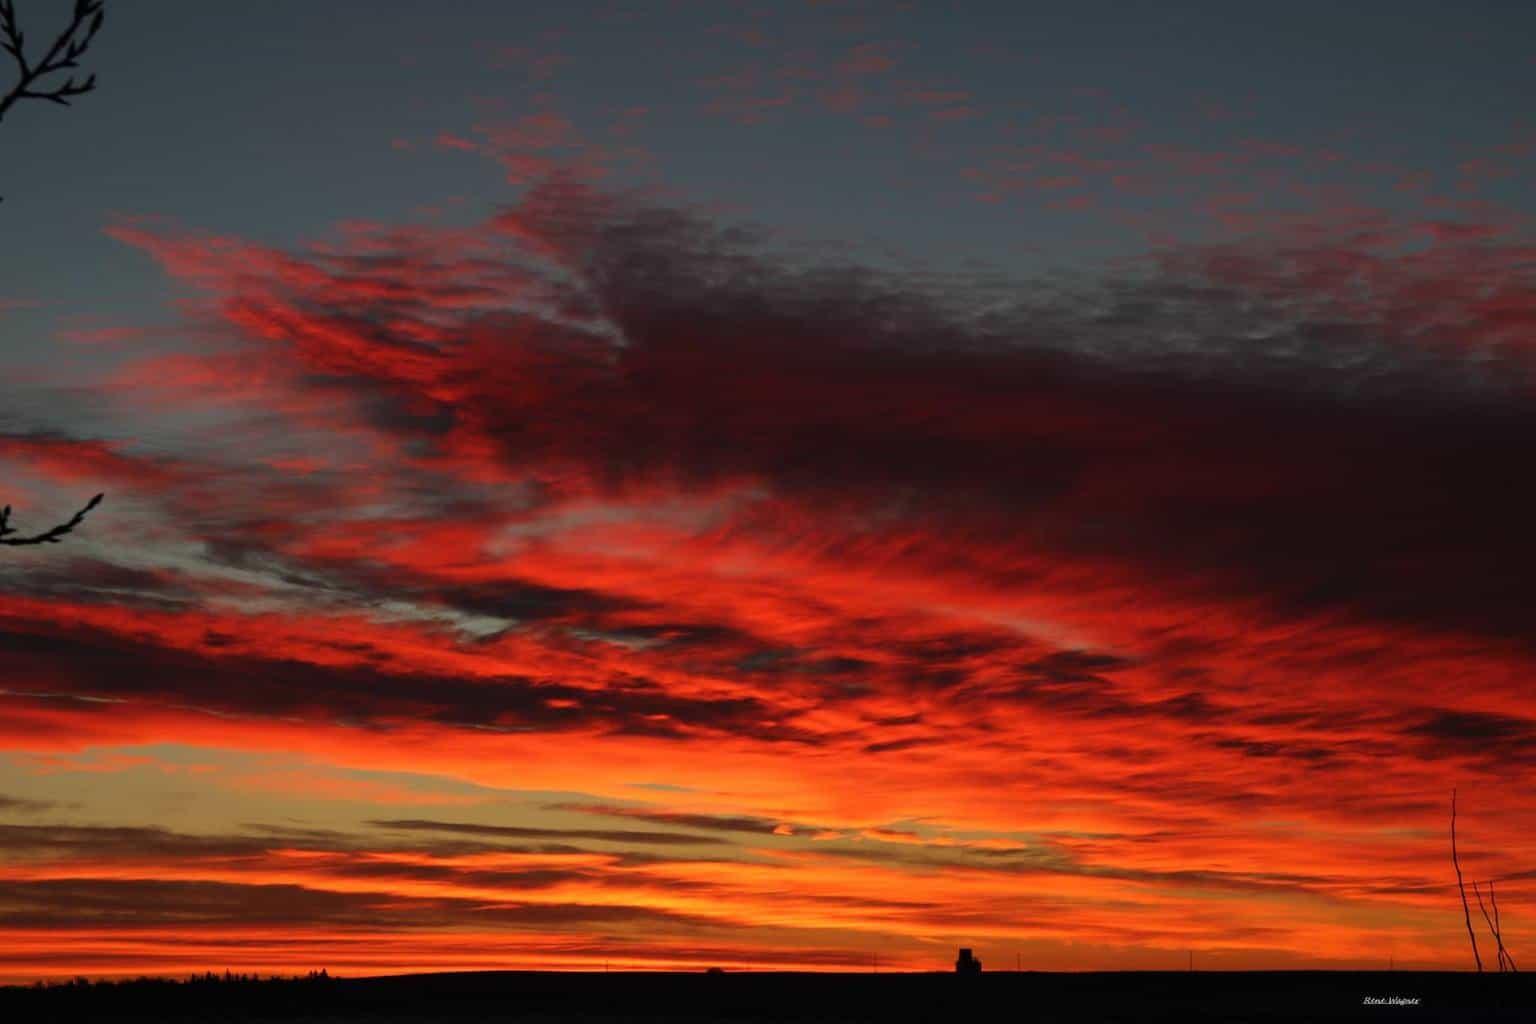 unedited sunrise shot from yesterday